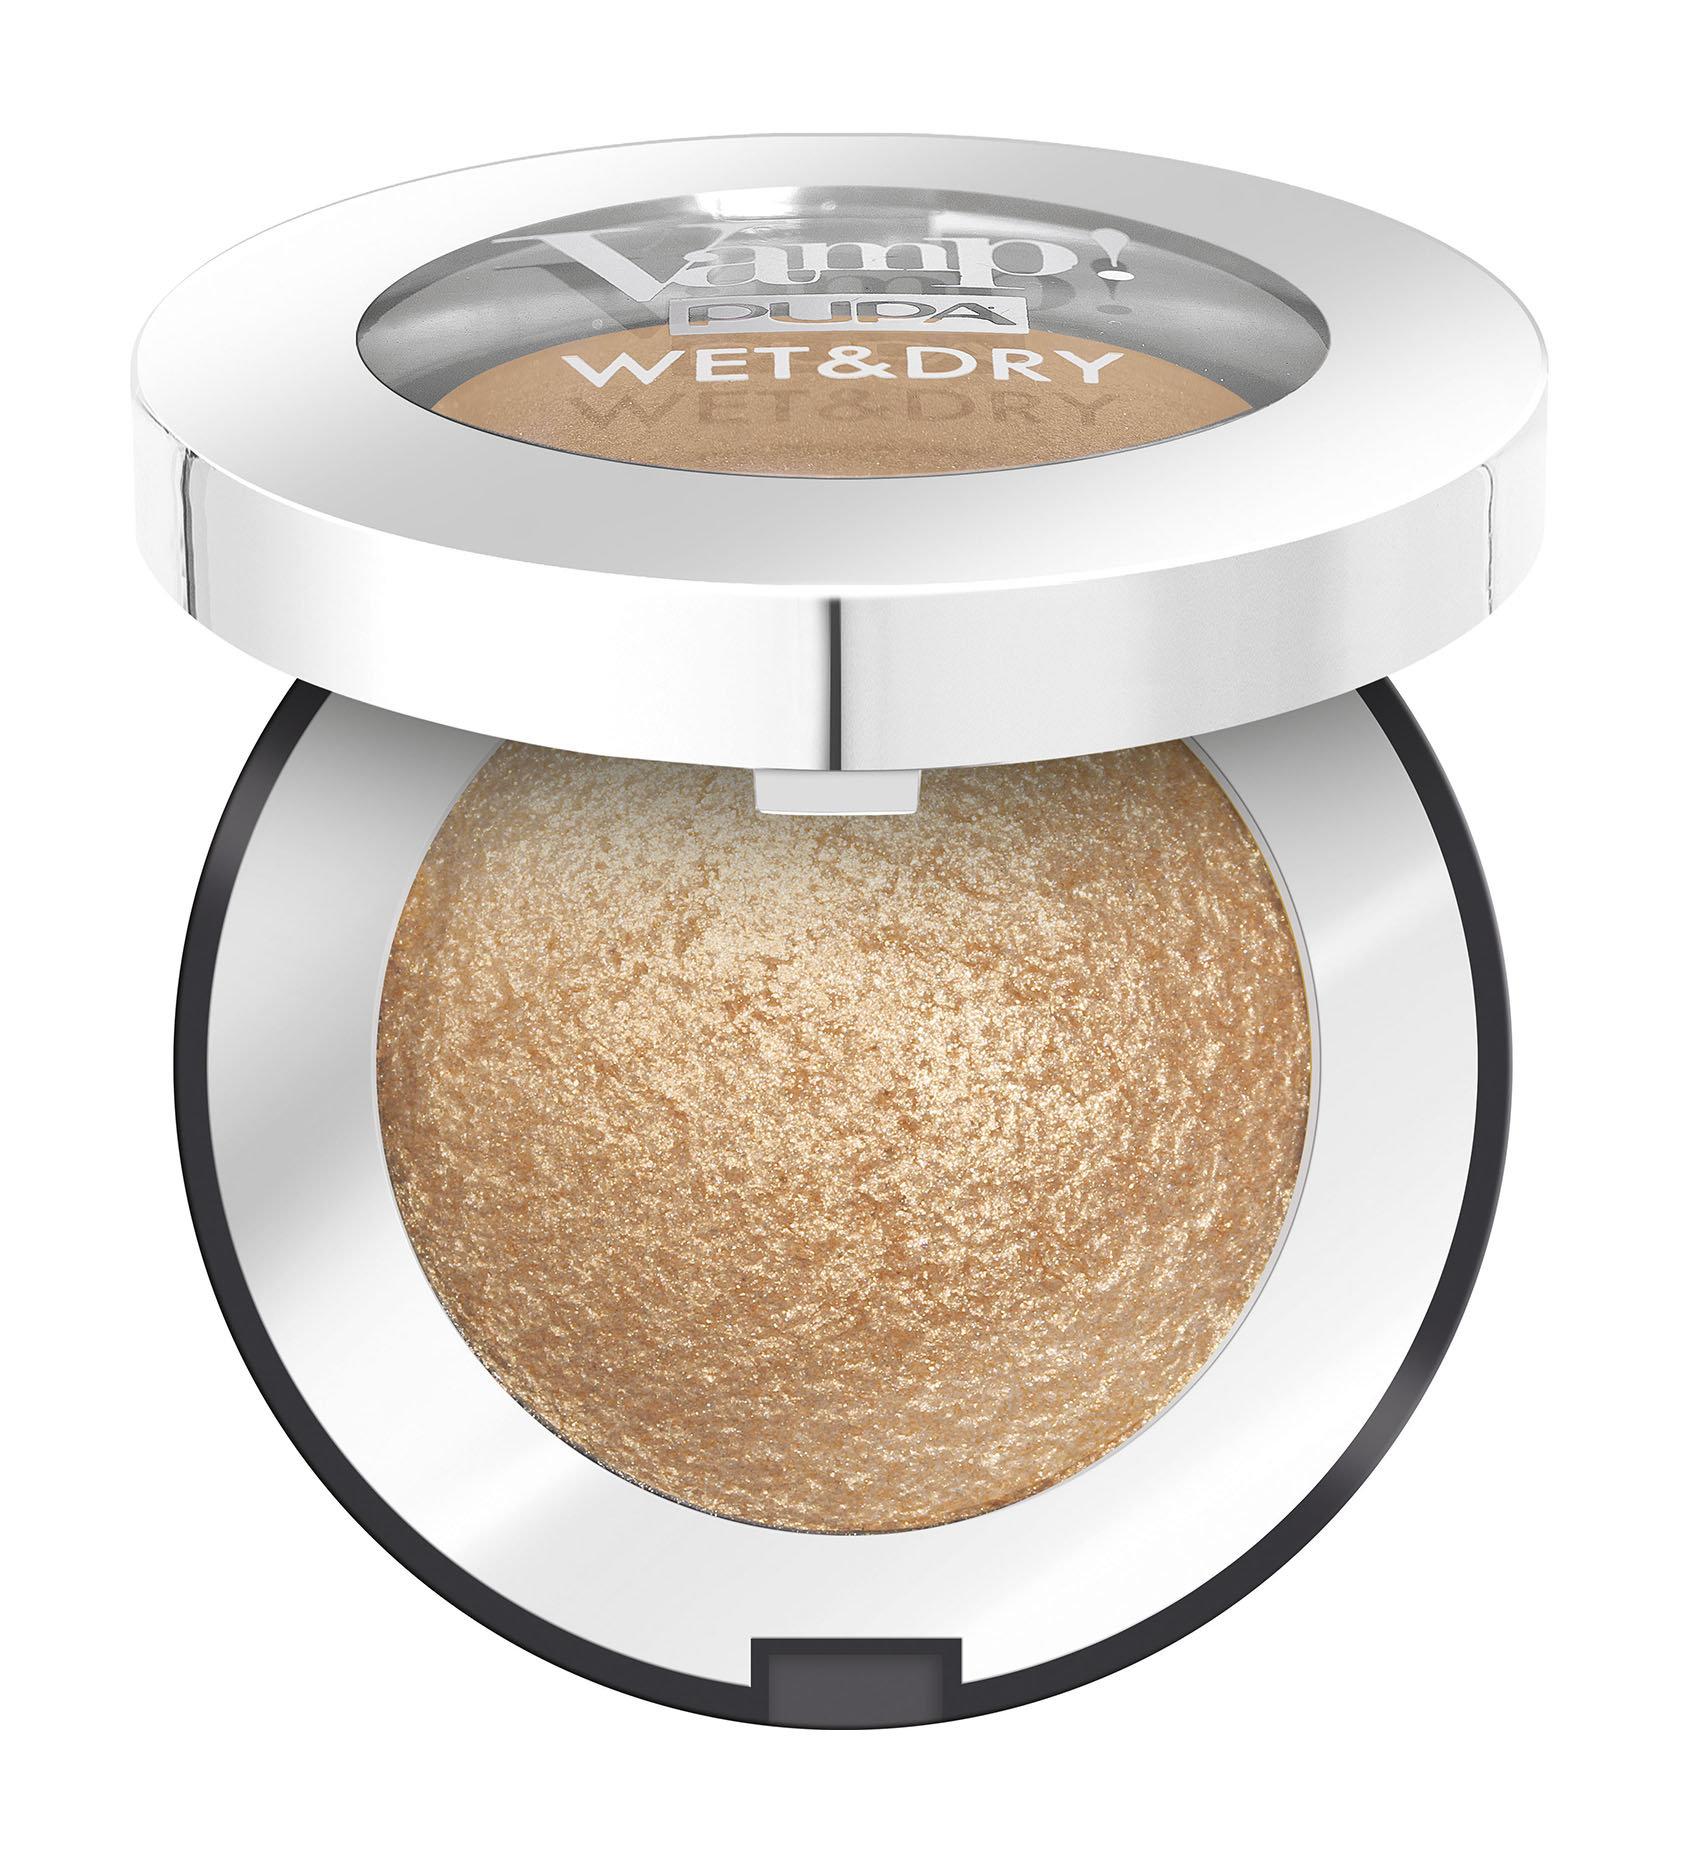 Купить Тени Pupa Vamp! Wet&Dry Eyeshadow 101 Precious Gold